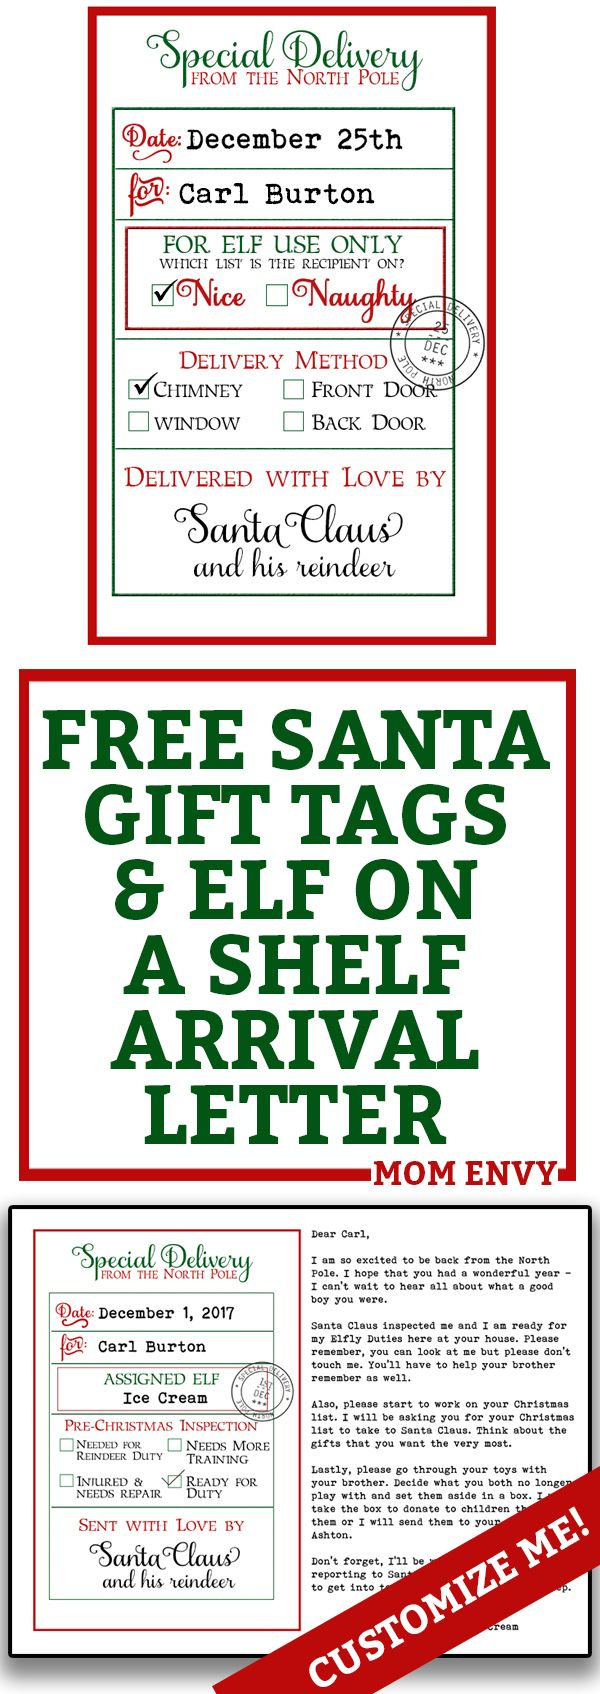 free custom santa gift tags and elf on a shelf arrival letter free printable christmas gift tags from santa and free elf on a shelf printable